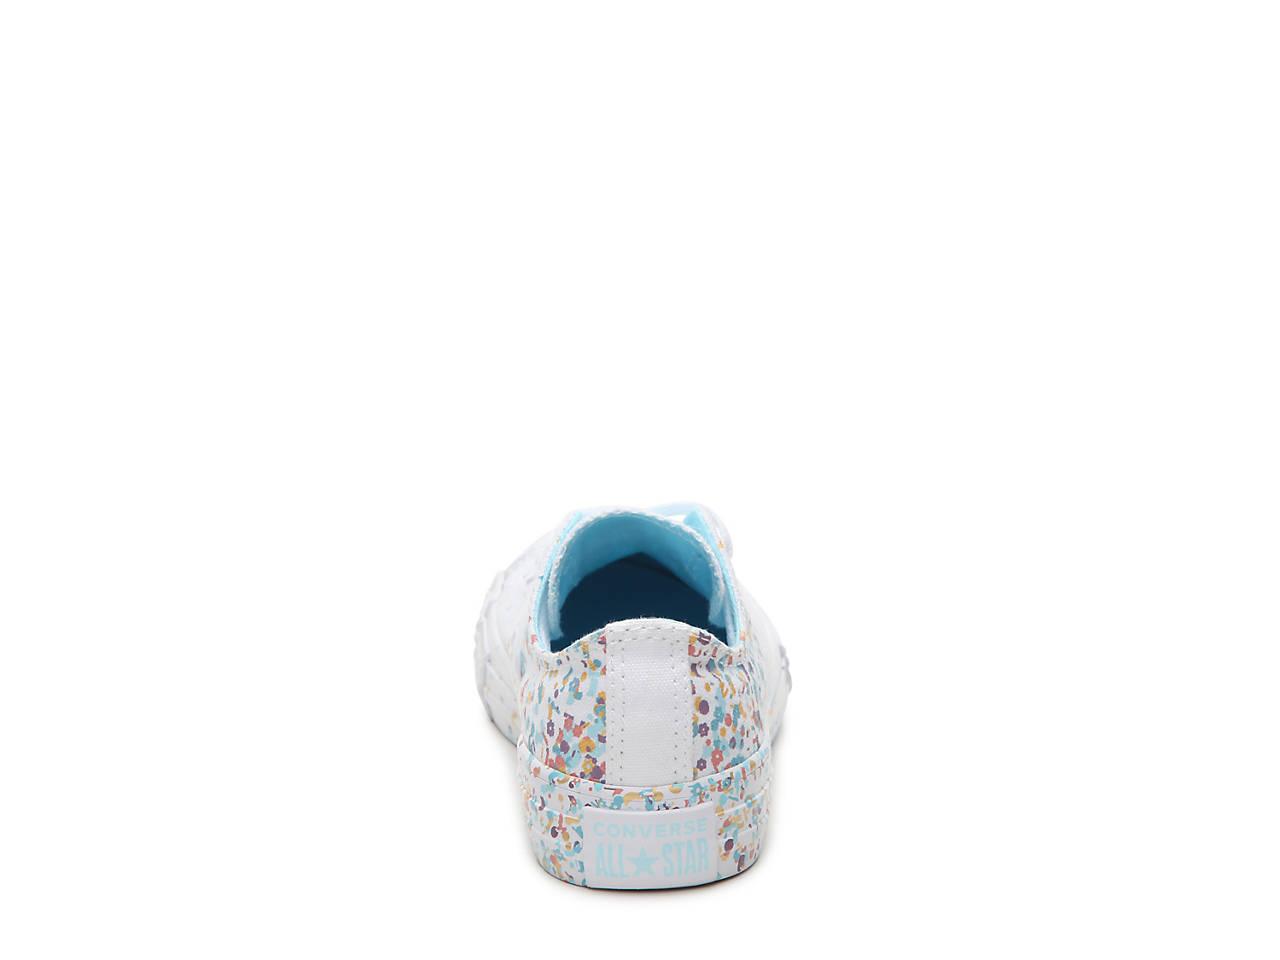 62dcfa1f70e Converse Chuck Taylor All Star Confetti Toddler   Youth Sneaker Kids ...